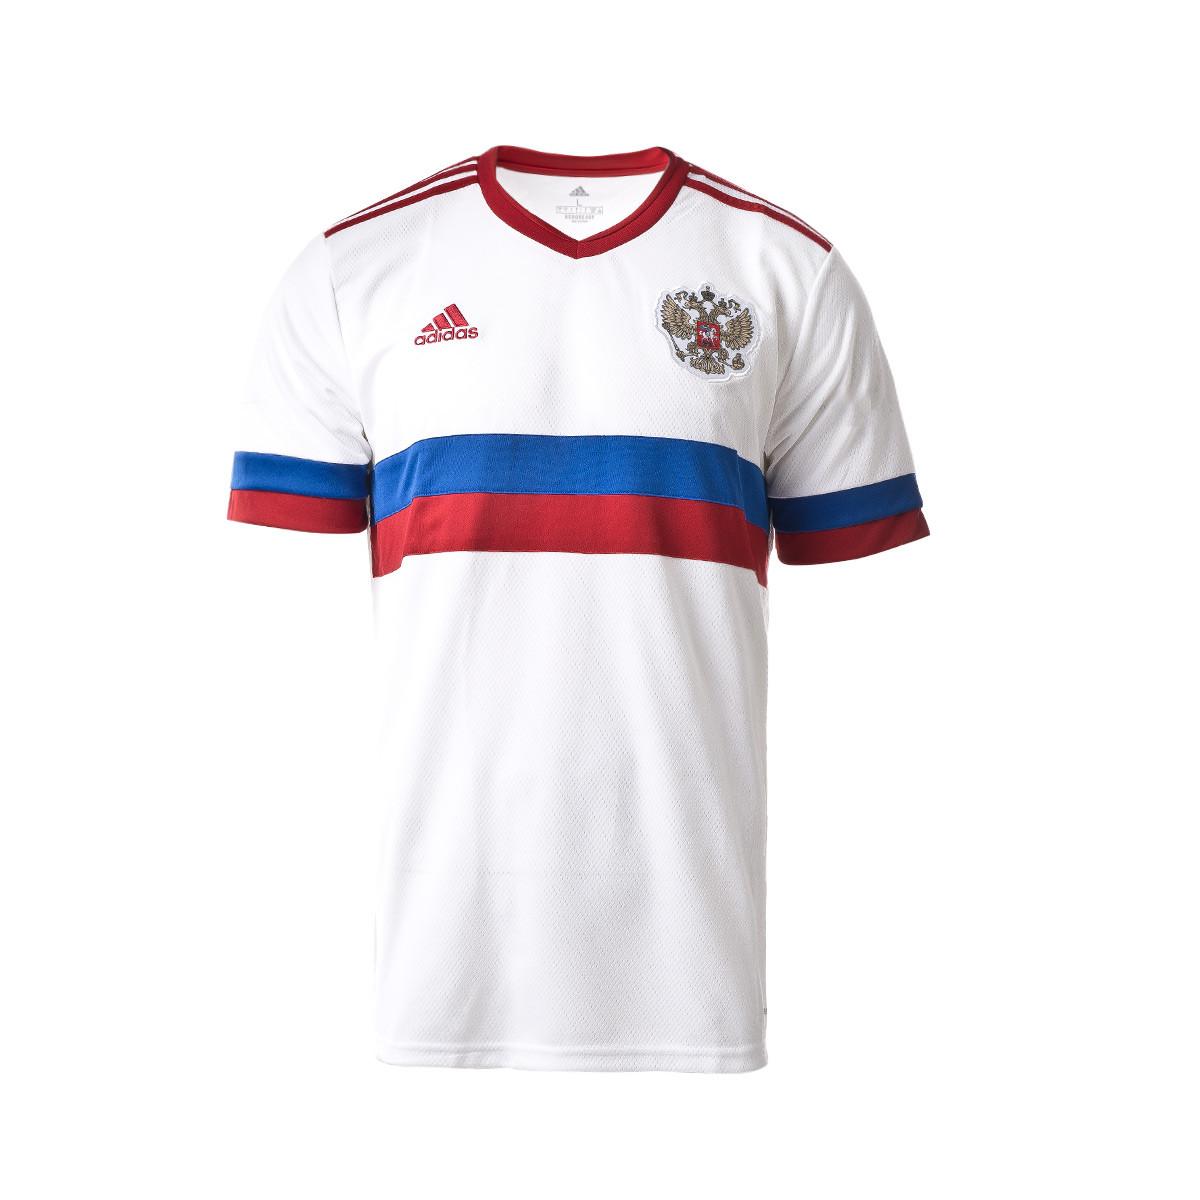 adidas Russia Away Jersey 2020-2021 Jersey